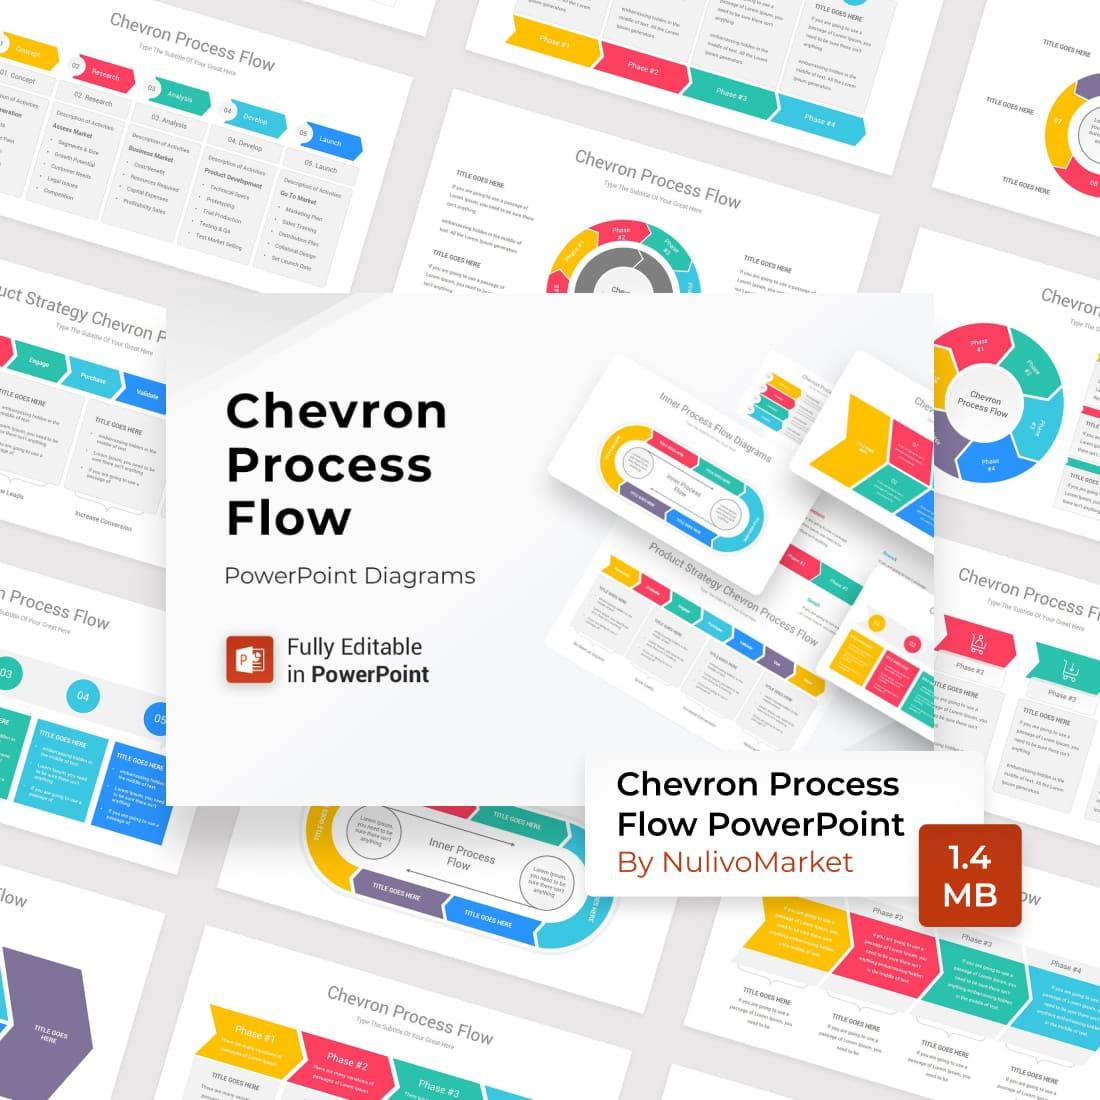 Chevron Process Flow PowerPoint by MasterBundles.